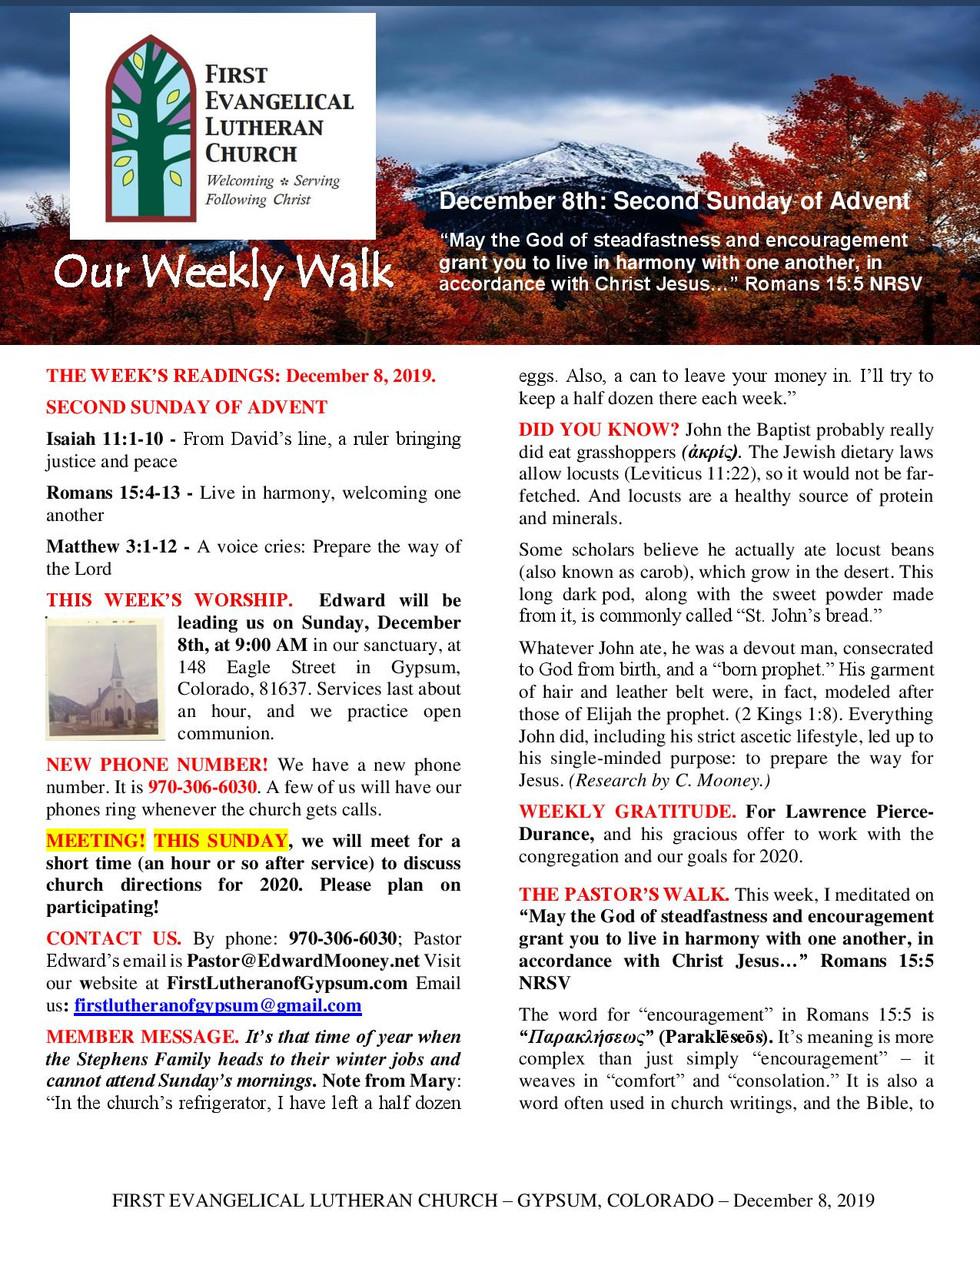 Newsletter, December 8, 2019, page 1